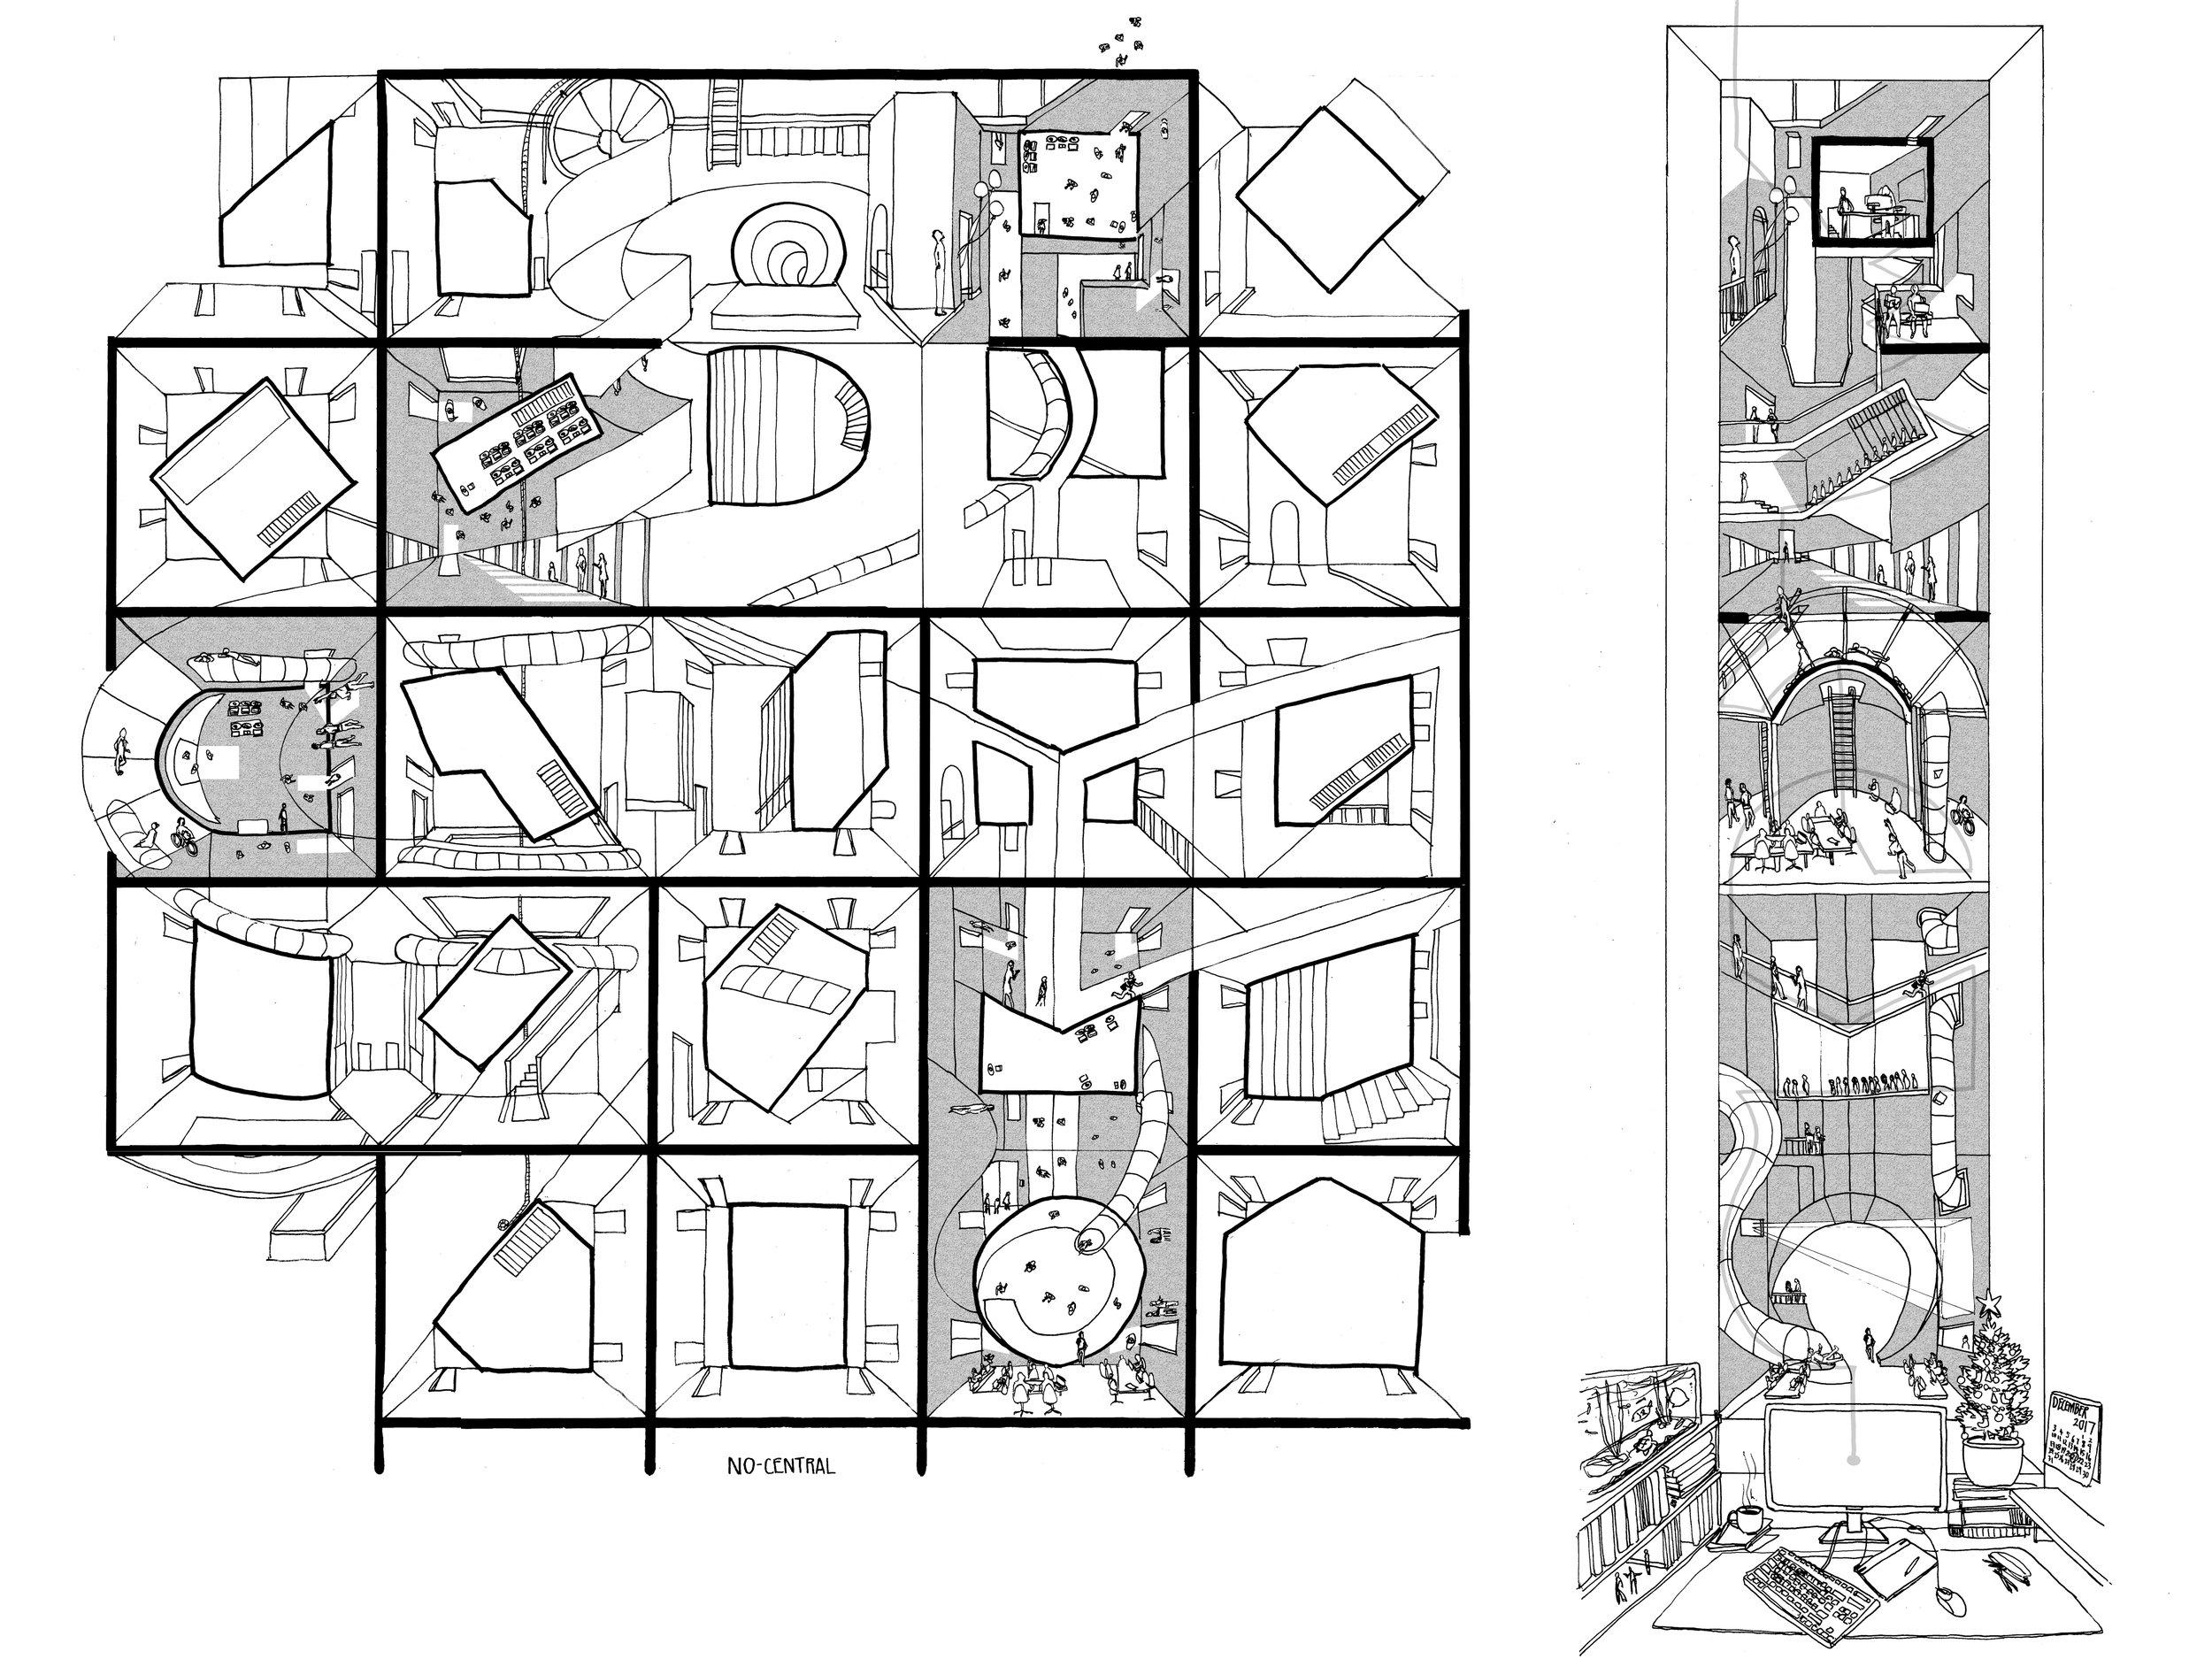 Schematic Compilation of Design Strategies